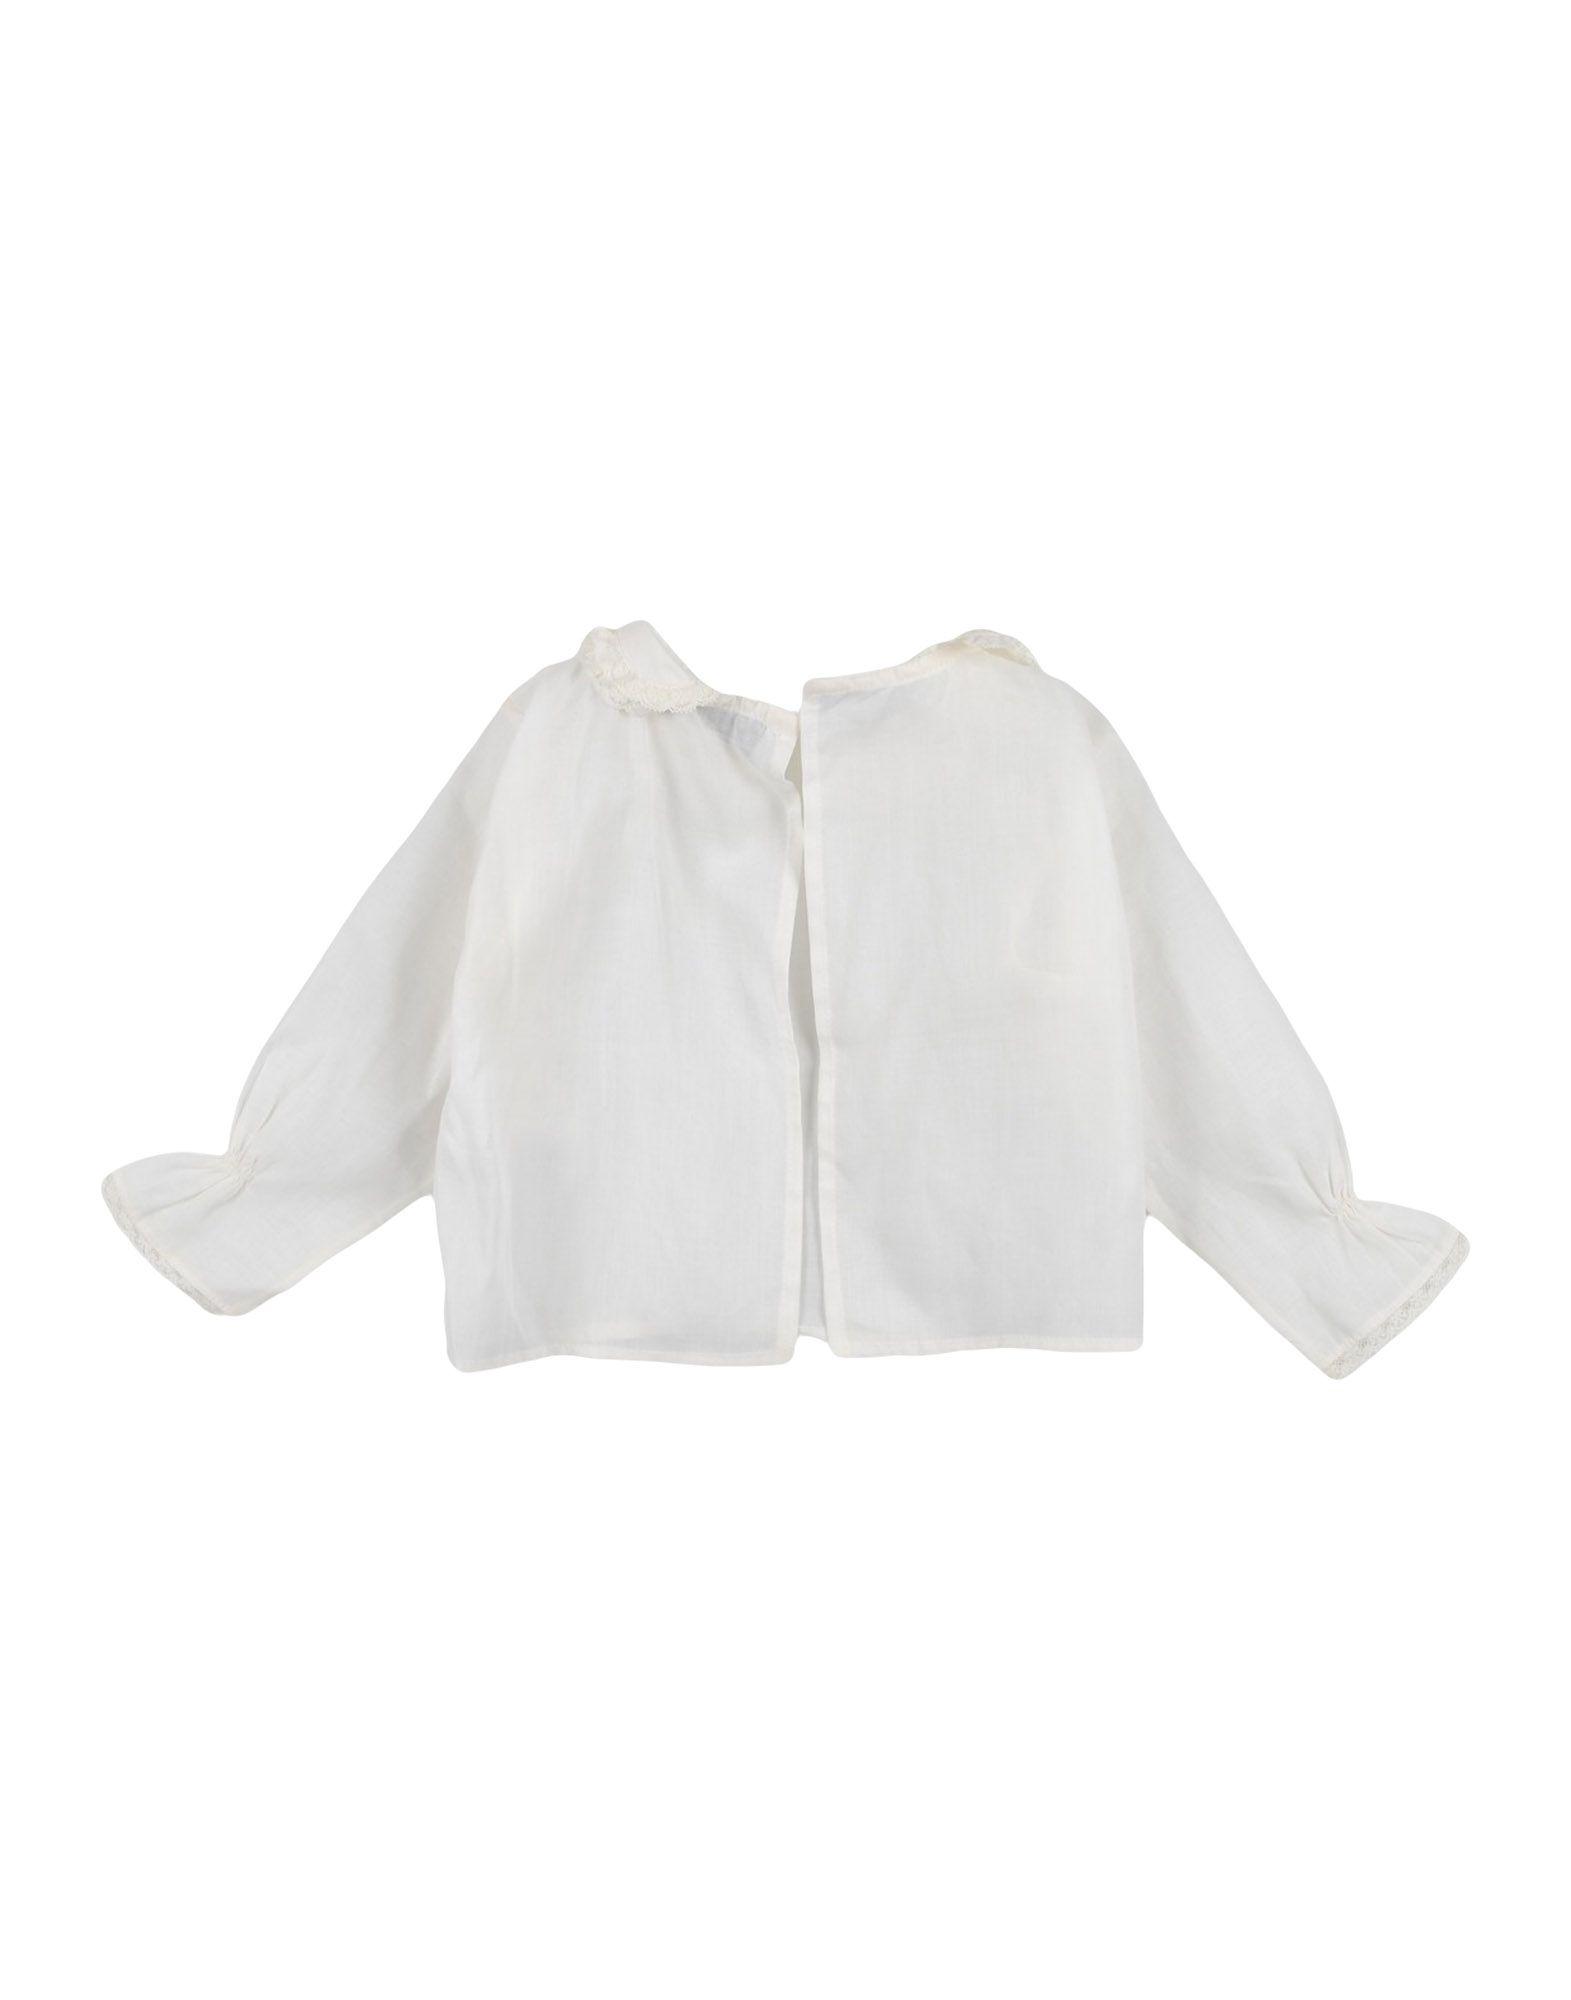 PILI CARRERA Blouse in White